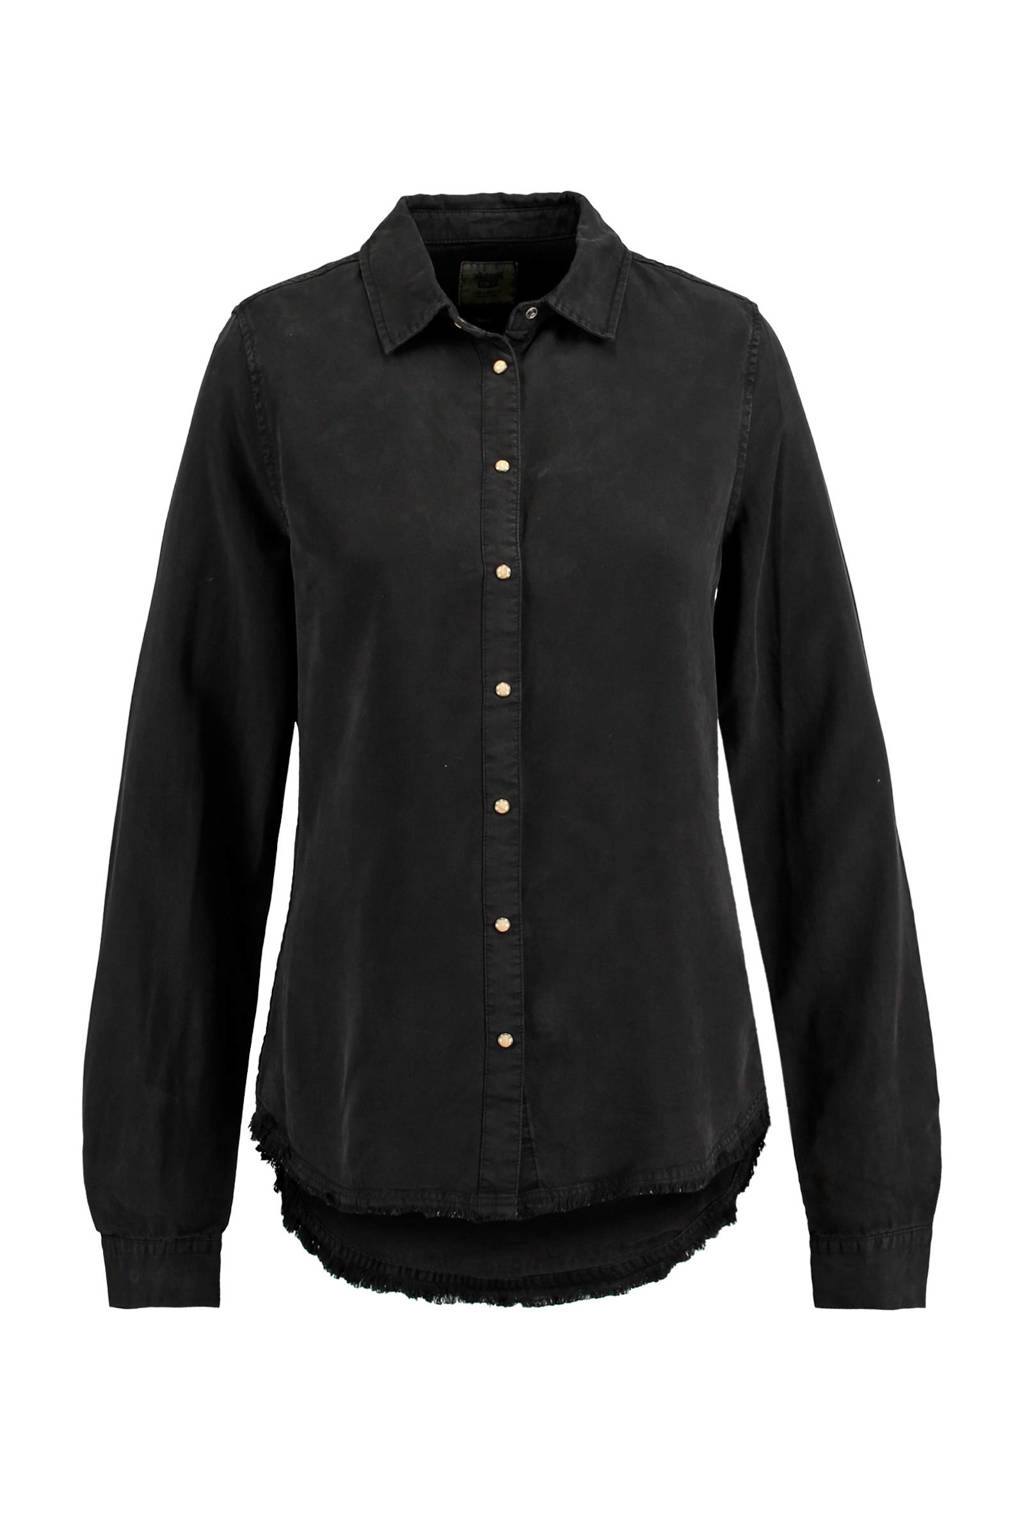 America Today tencel blouse zwart, Zwart